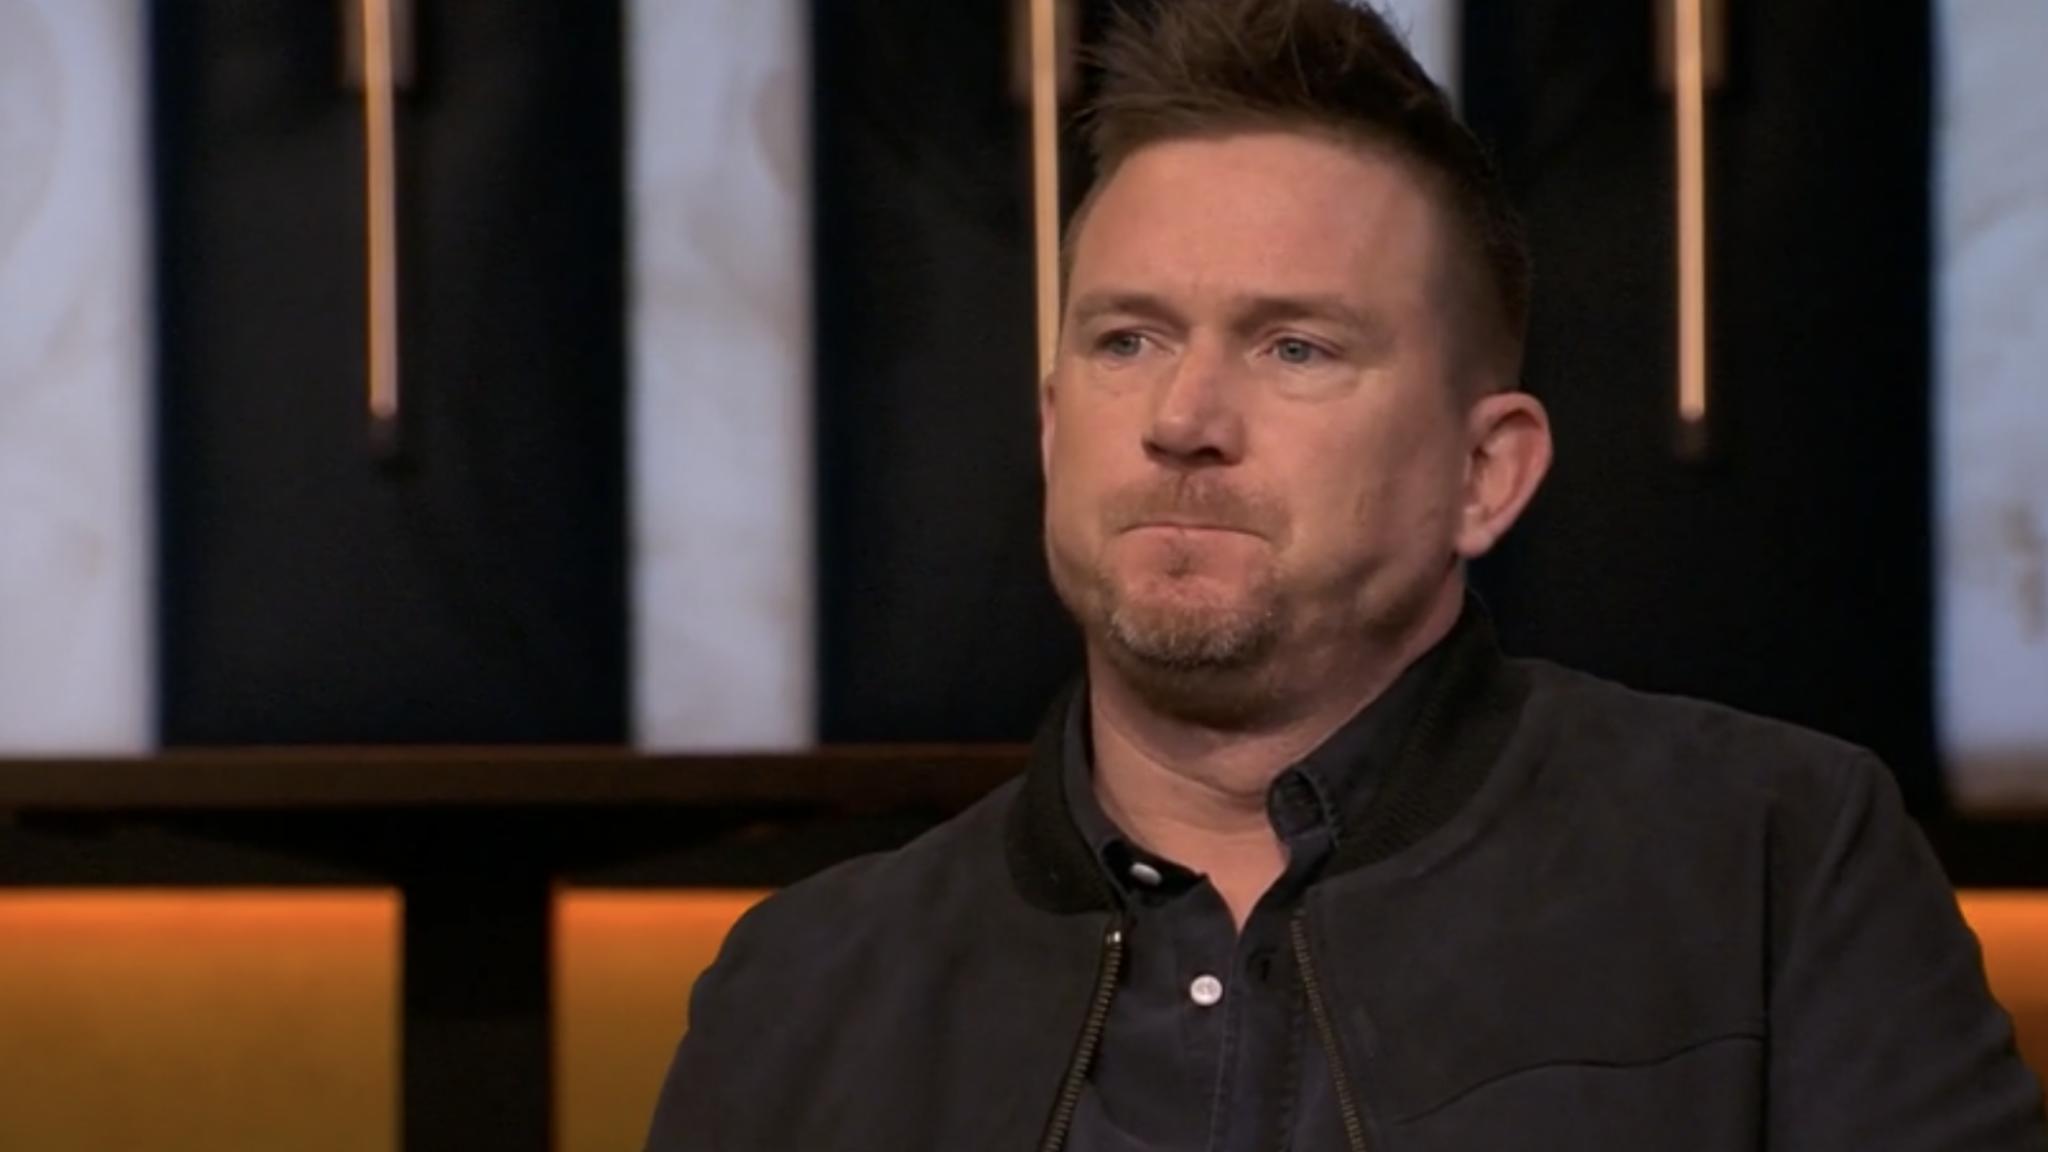 Johnny De Mole denies previous manslaughter attempt: 'it goes away'